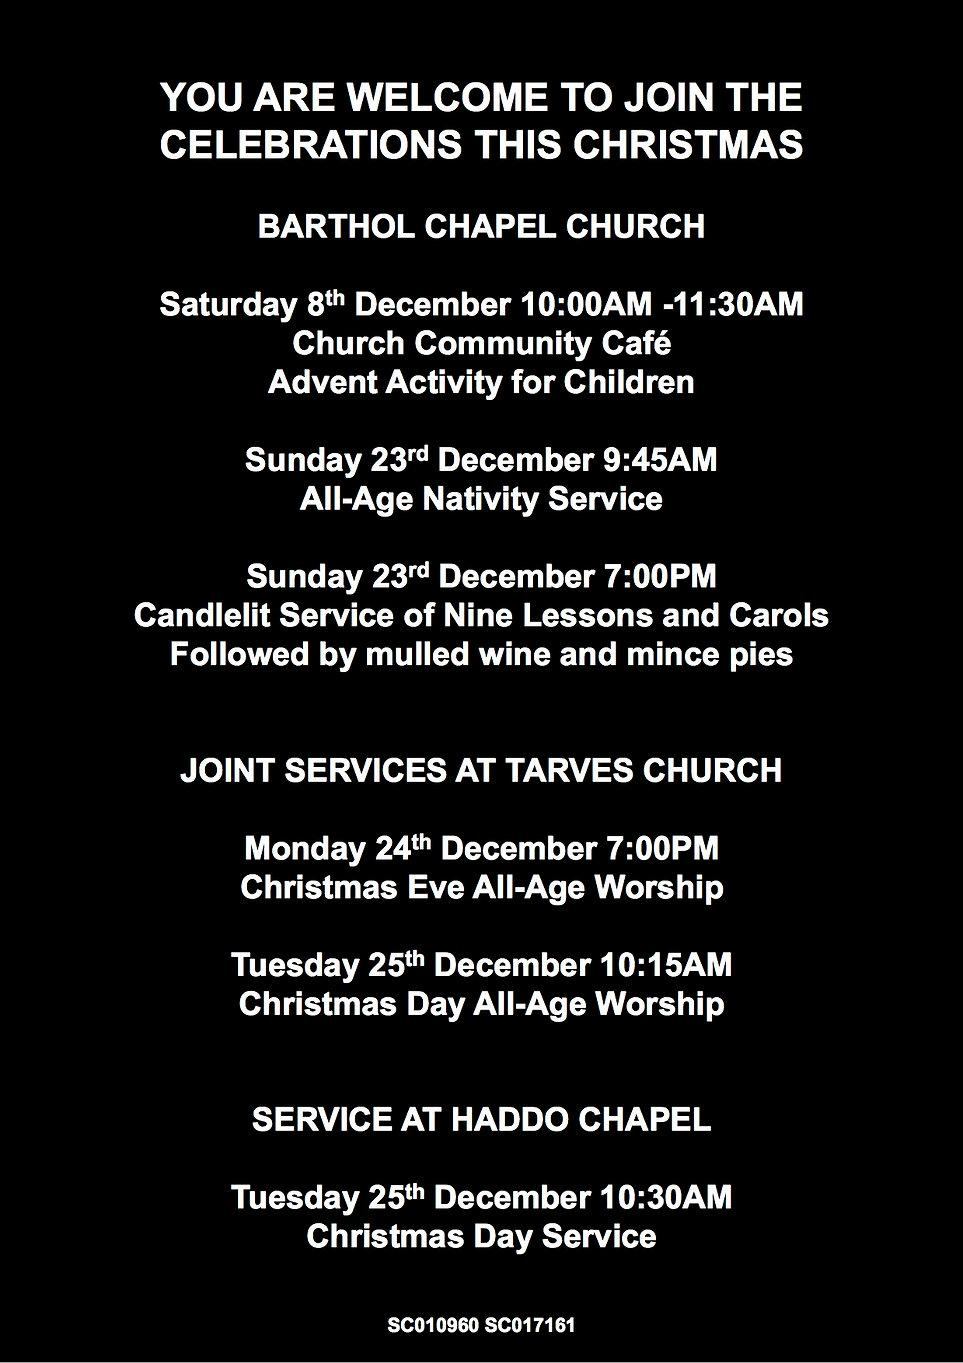 Barthol Chapel Church Christmas invitati